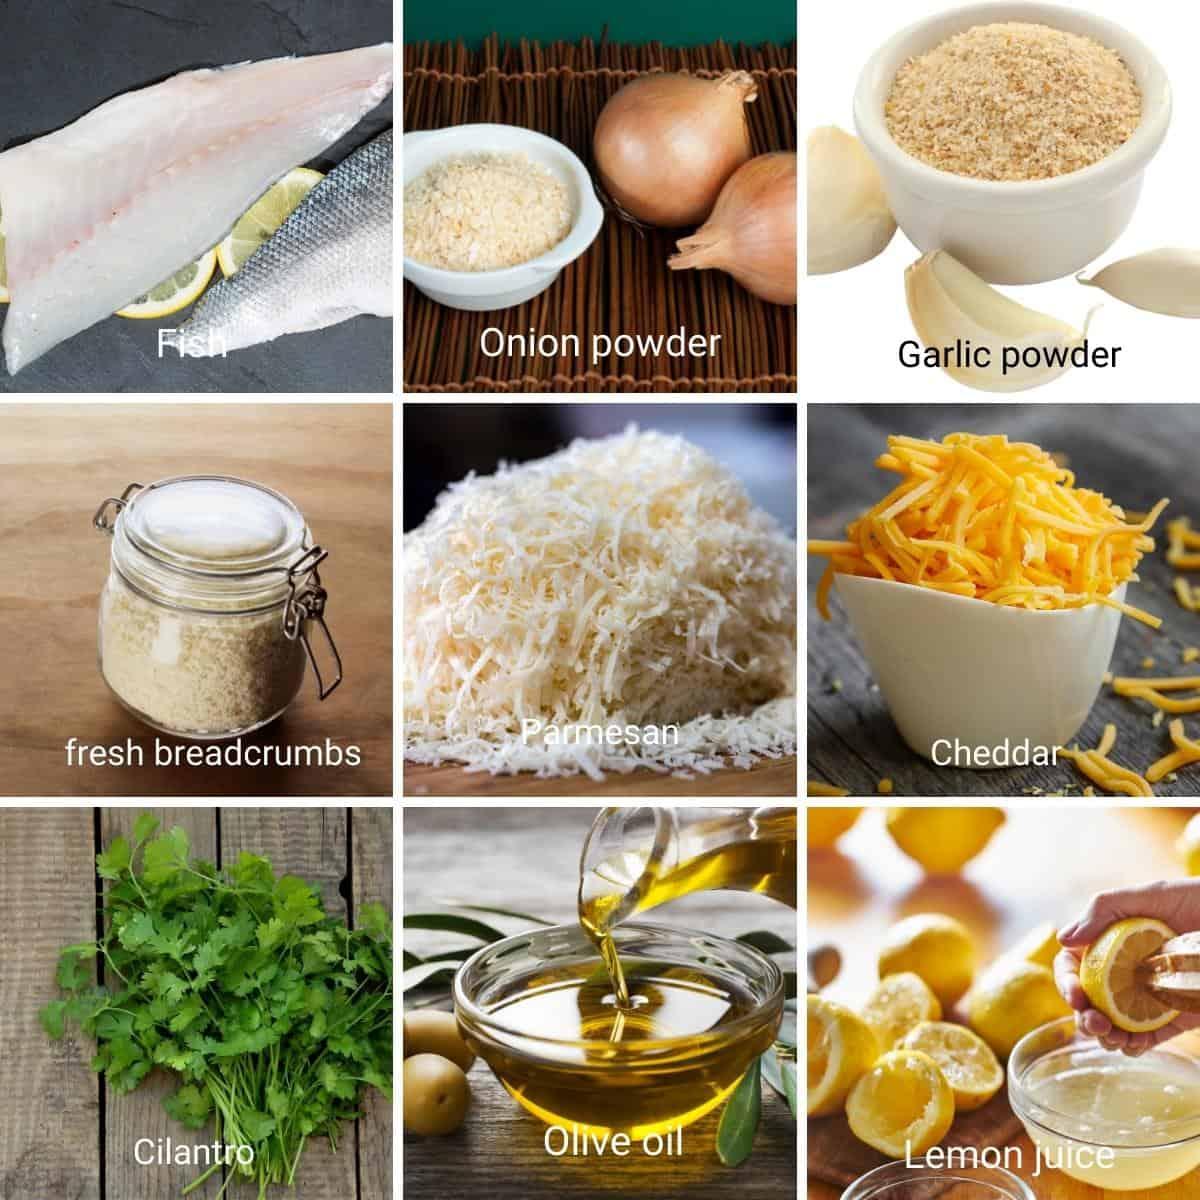 Ingredients for making baked fish fillets.